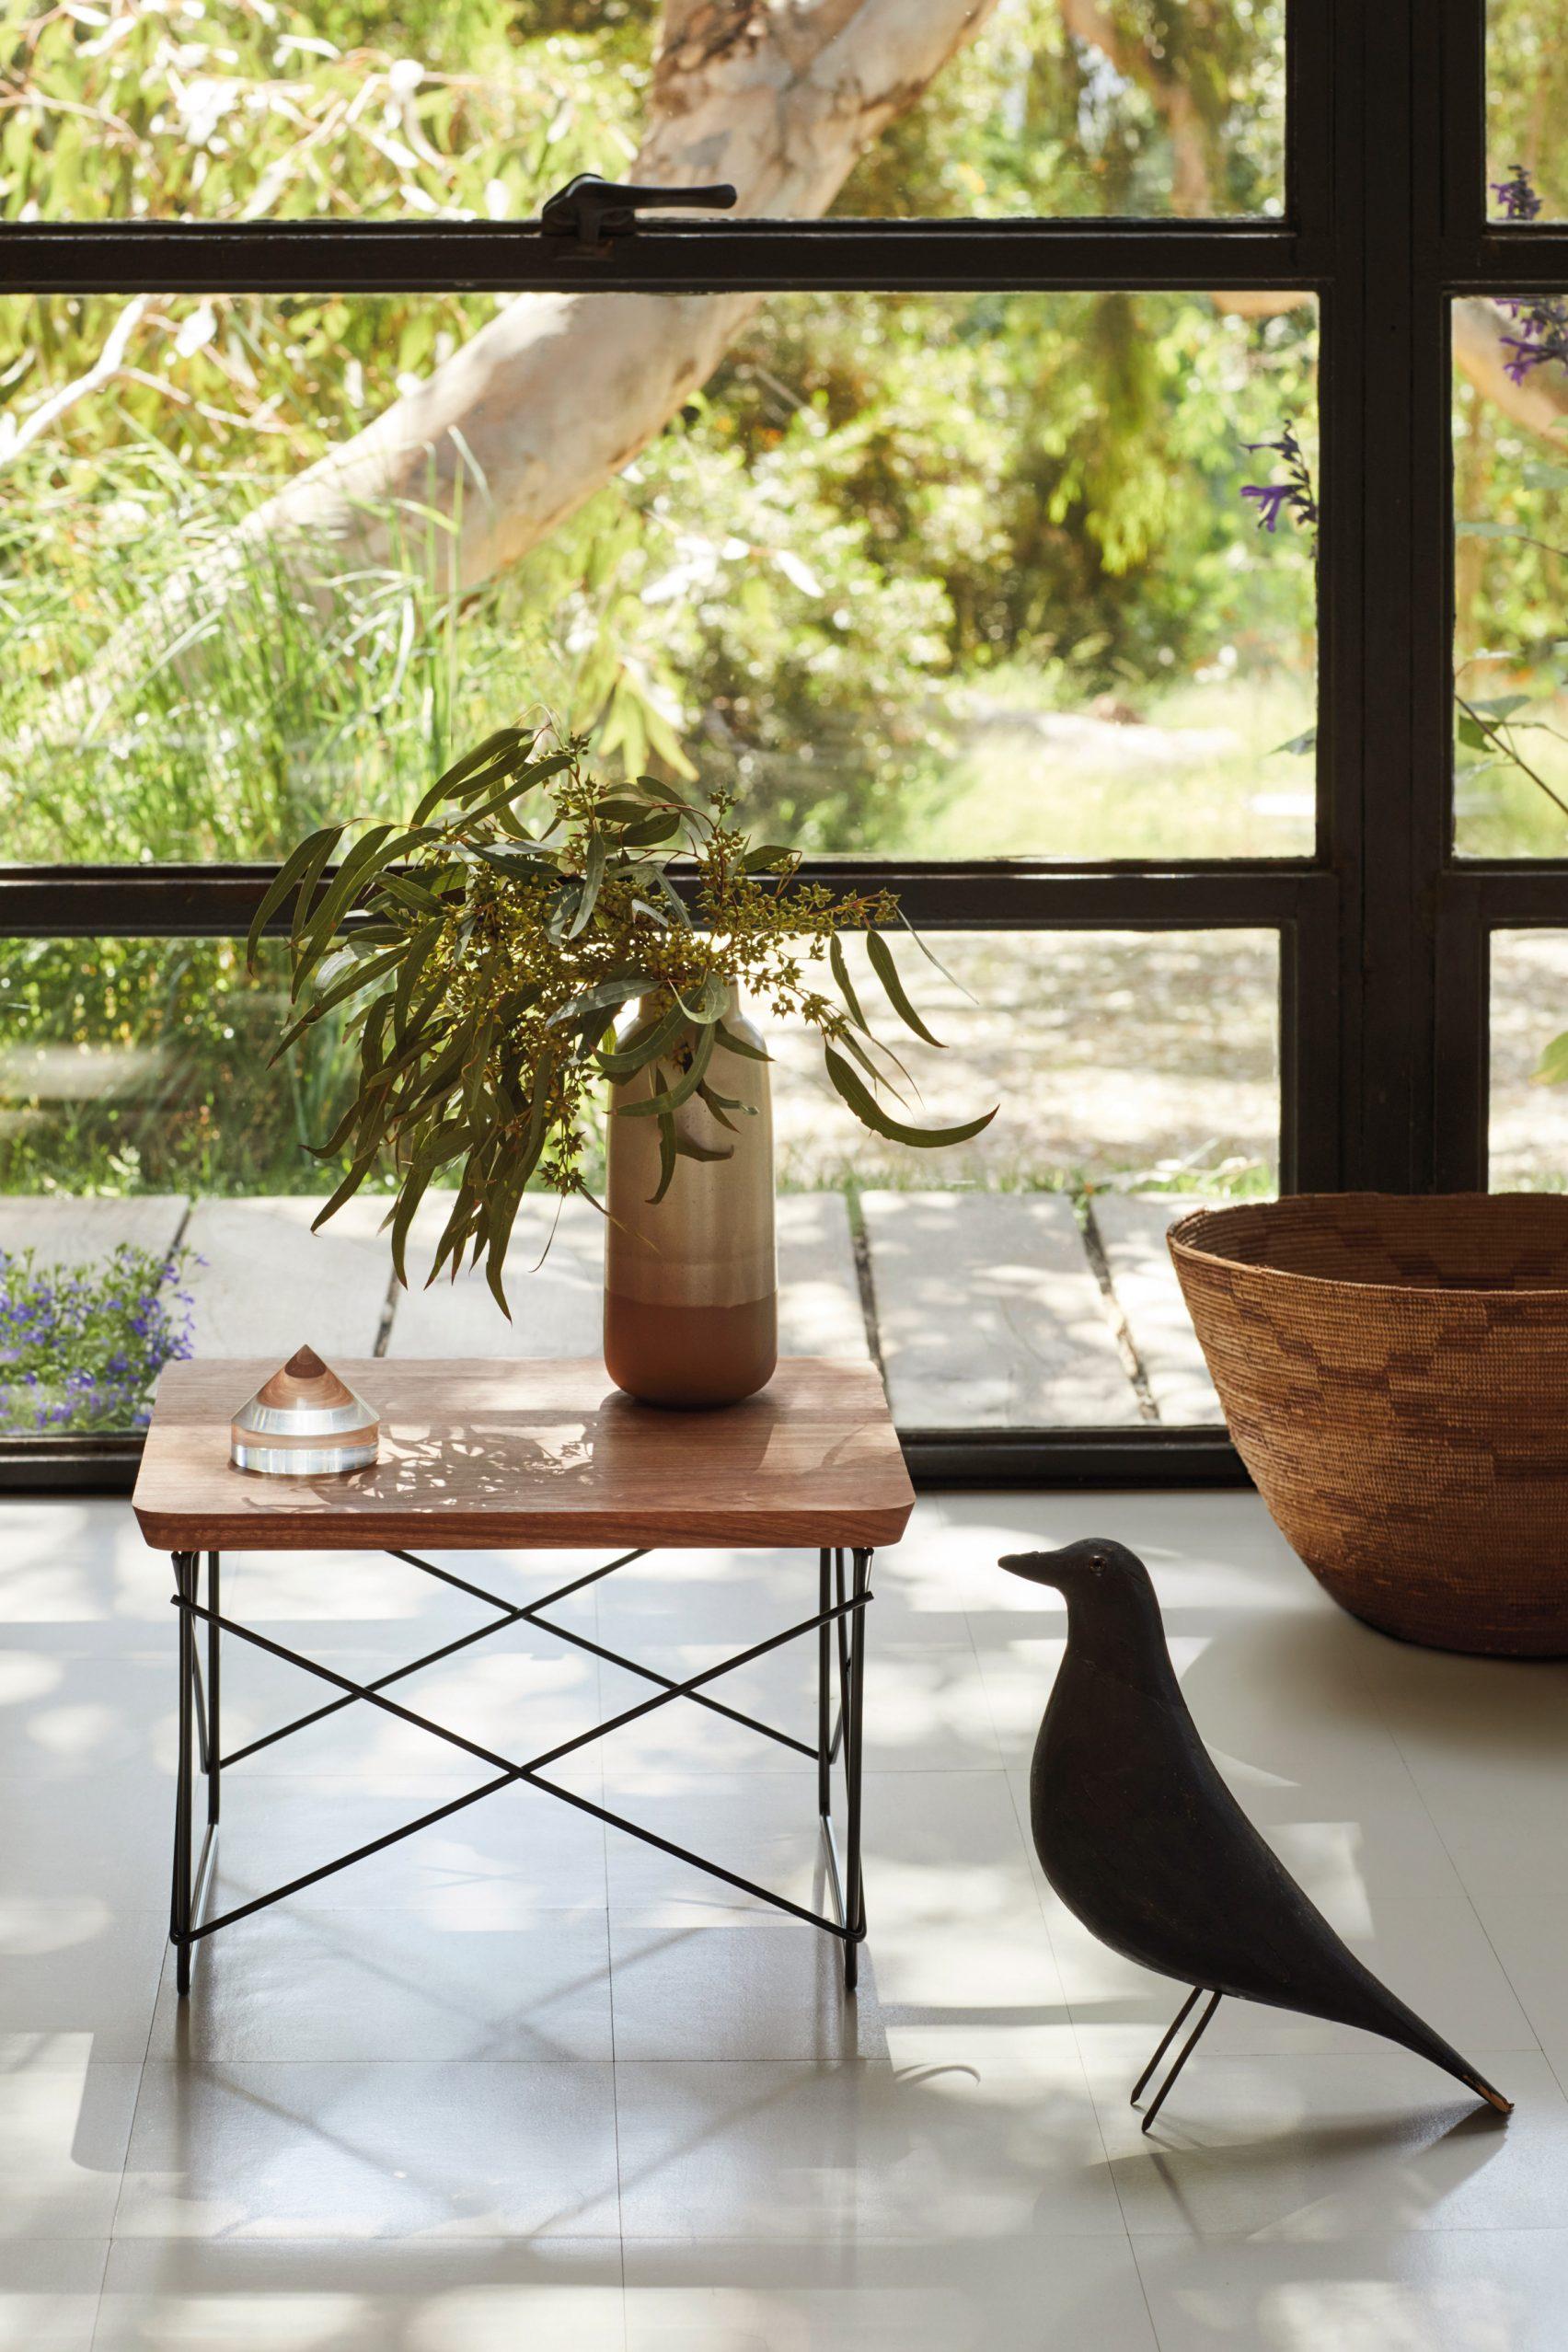 vitra-herman-miller-eames-eucalyptus-ltr-tables-_dezeen_2364_col_10-1704x2556.jpg